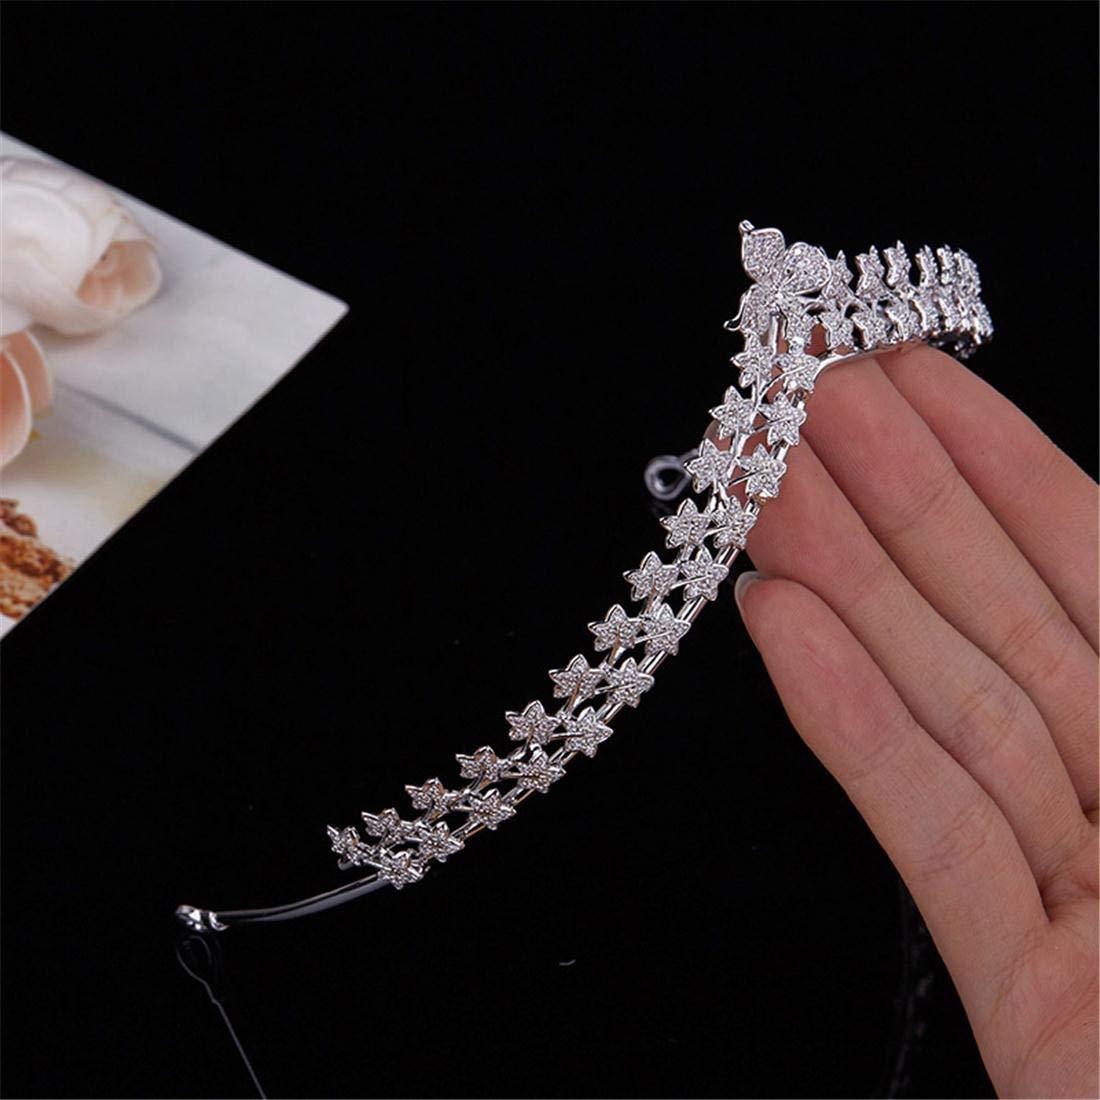 Fubulecy Crown Head Jewelry Simple Four Leaf Clover Flower High